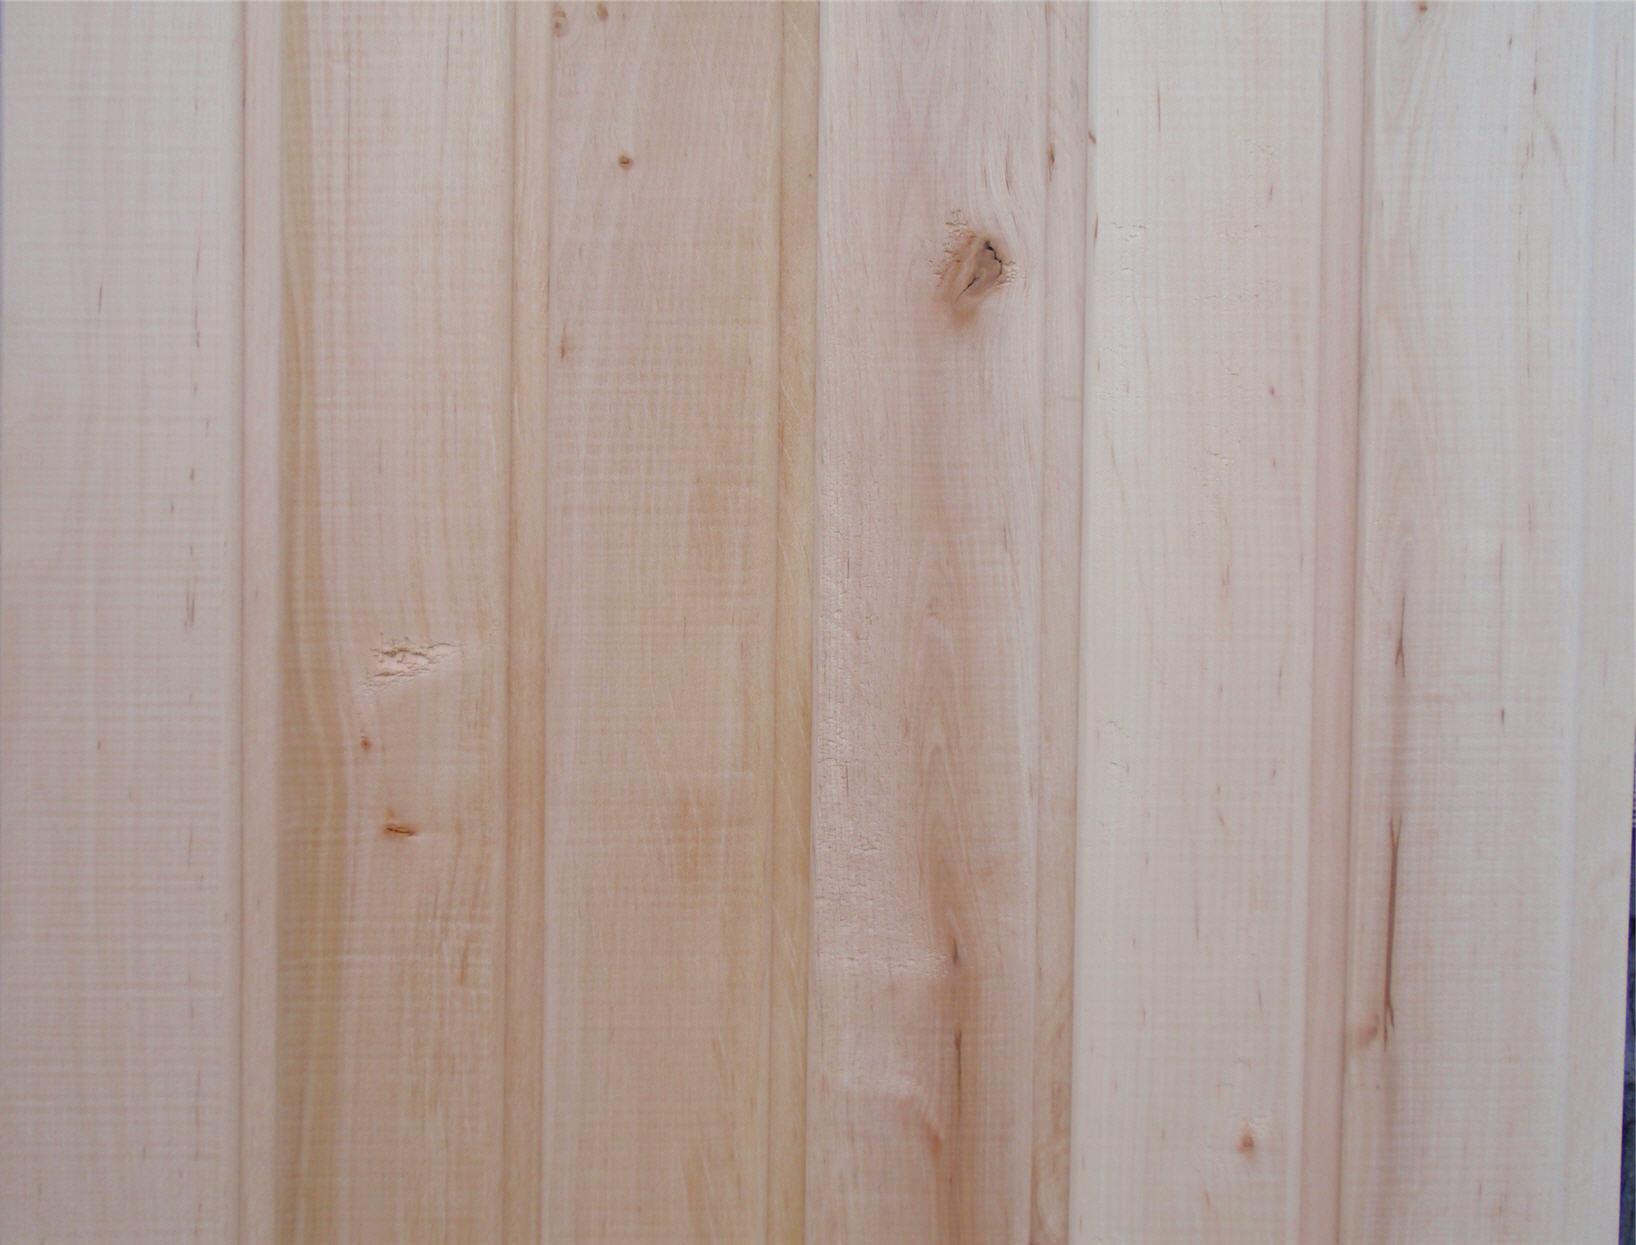 Prix lambris plafond bois prix travaux maison aulnay for Prix lambris pvc plafond